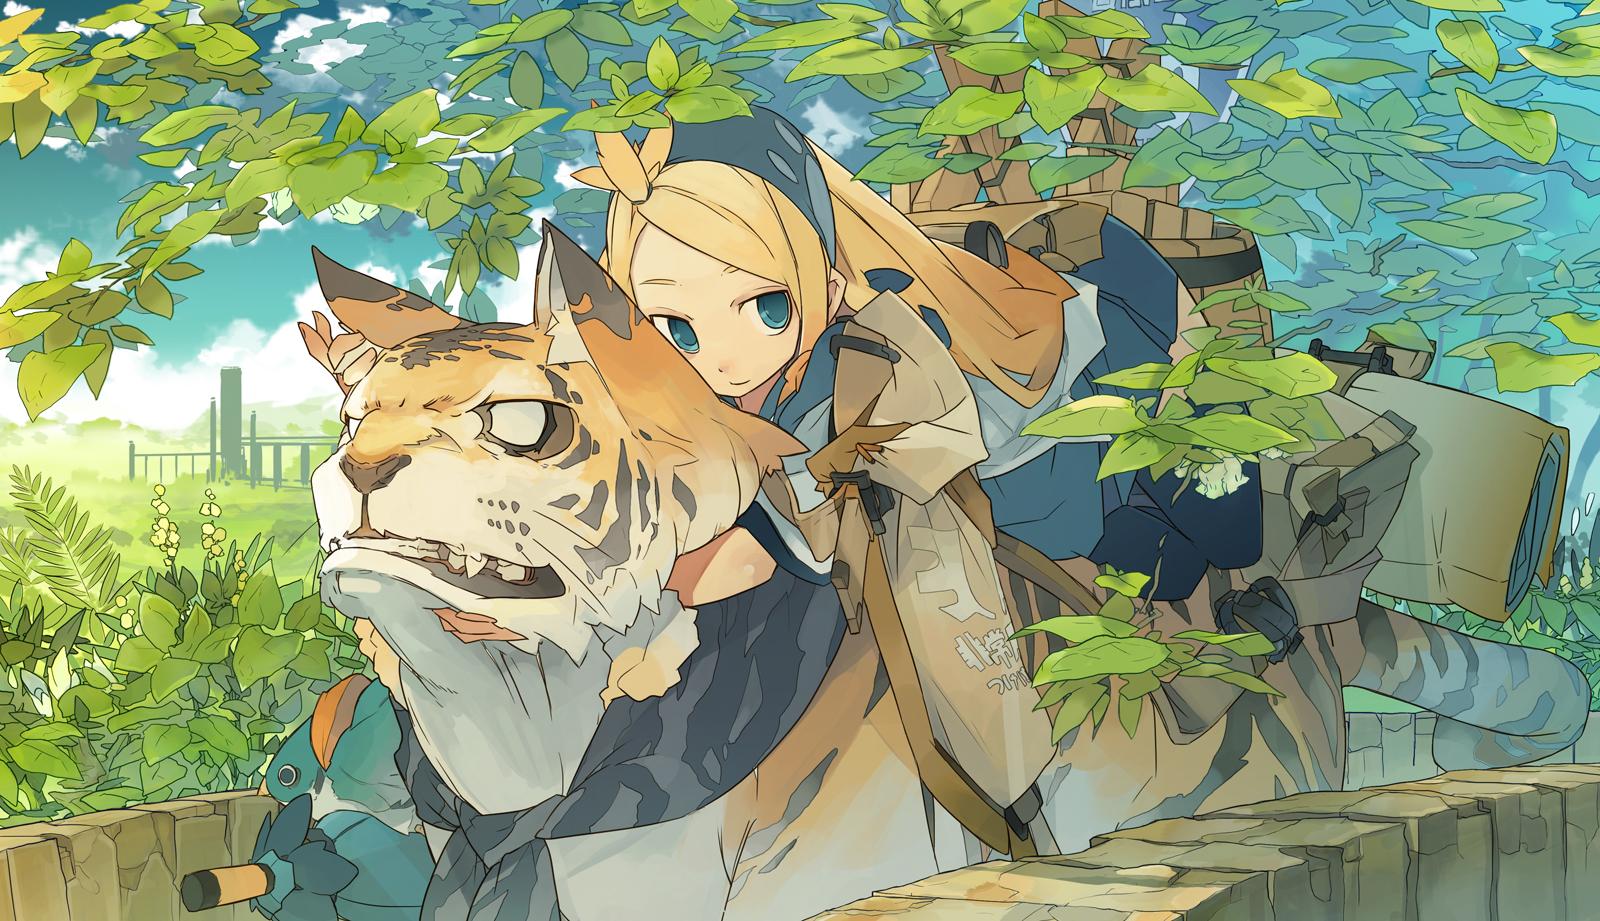 картинки тигров аниме: